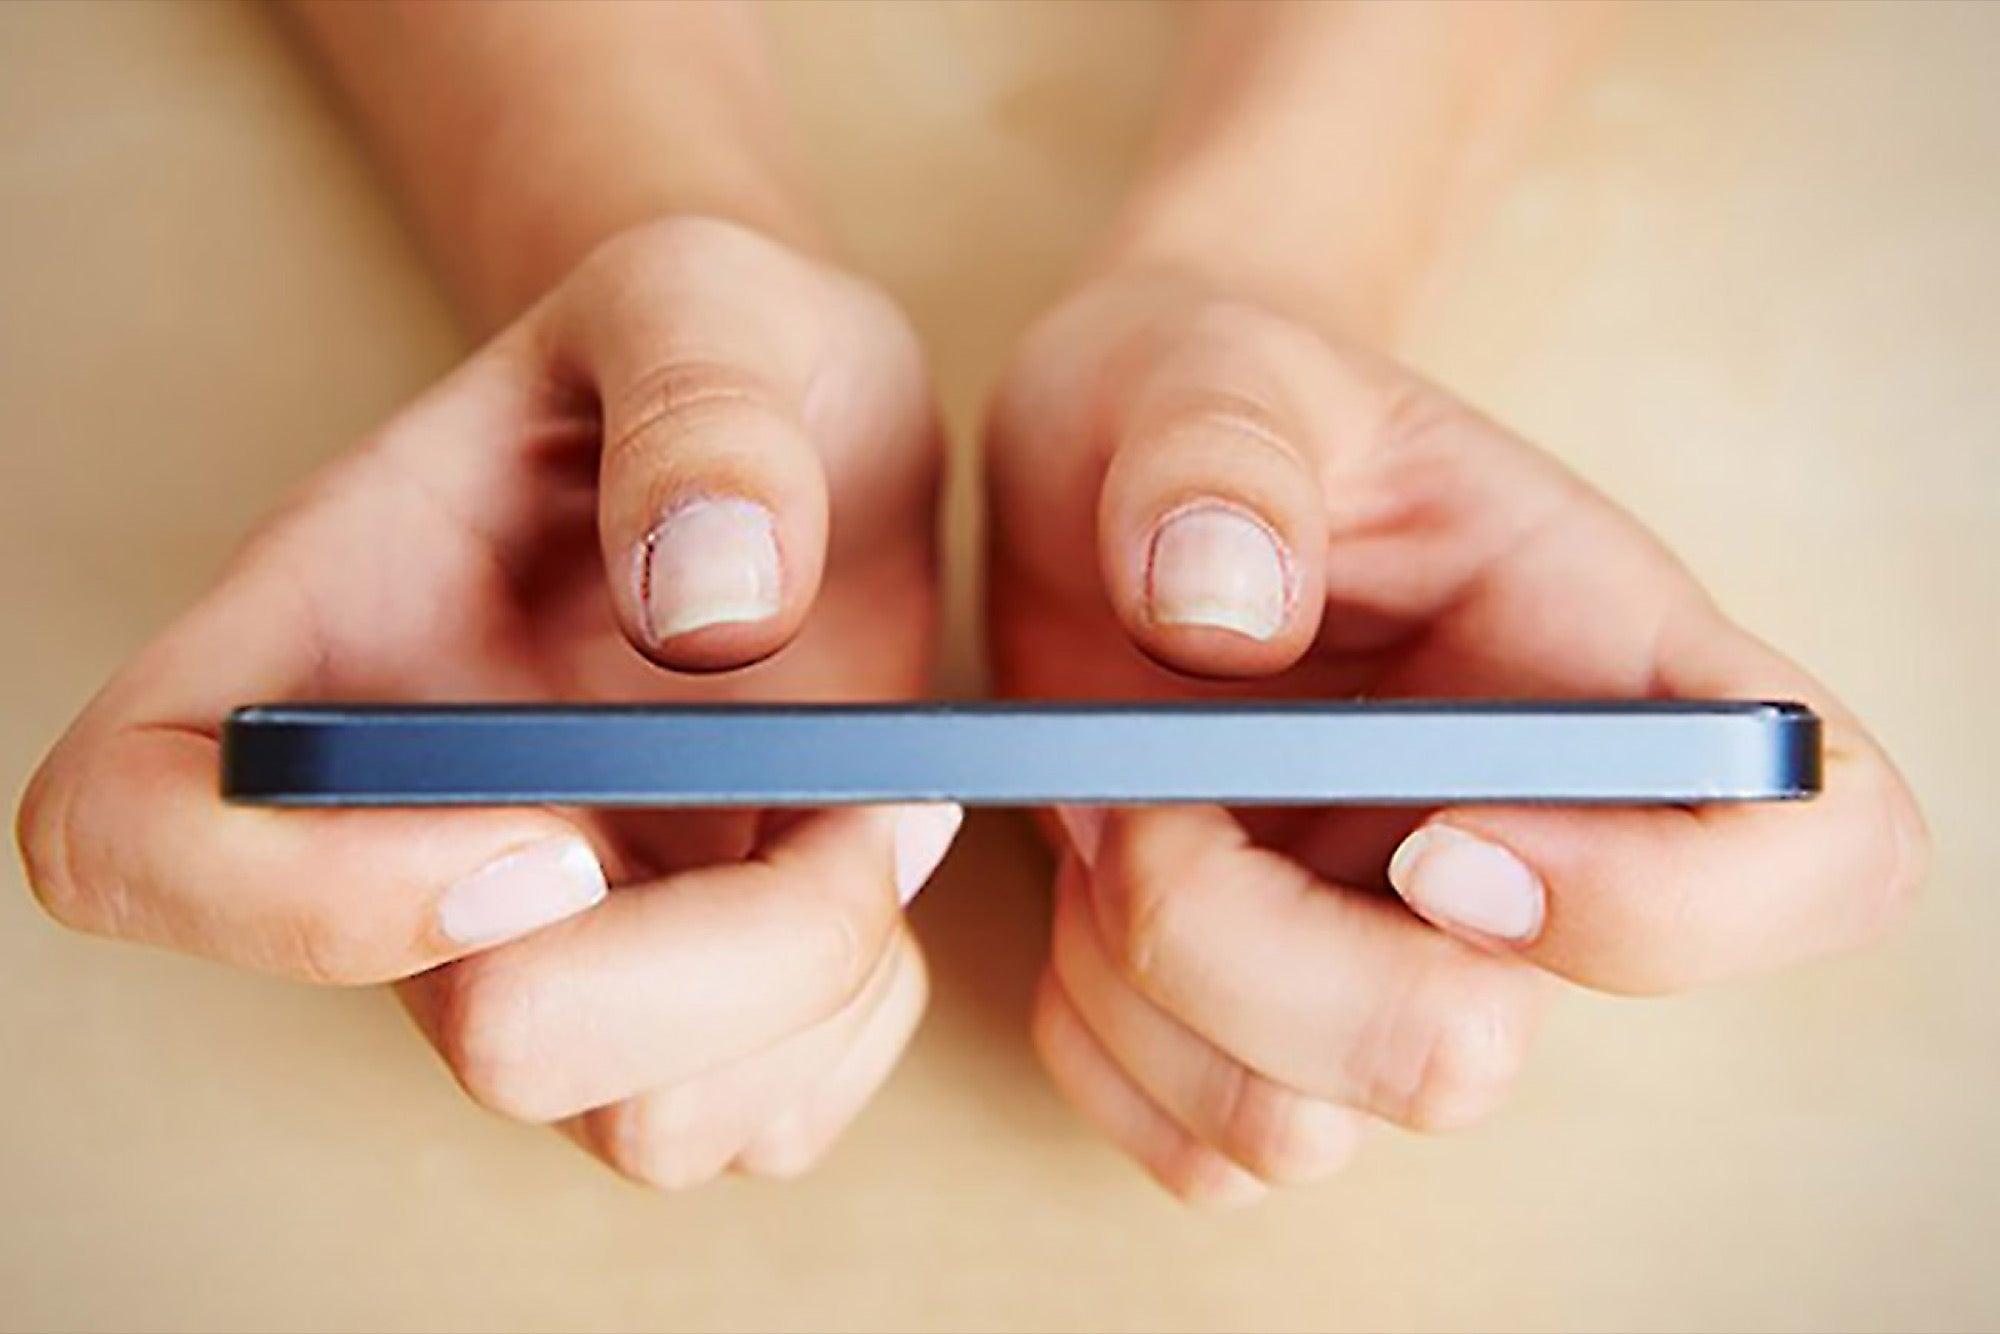 How 'App-preneurs' Turn Ideas into Business